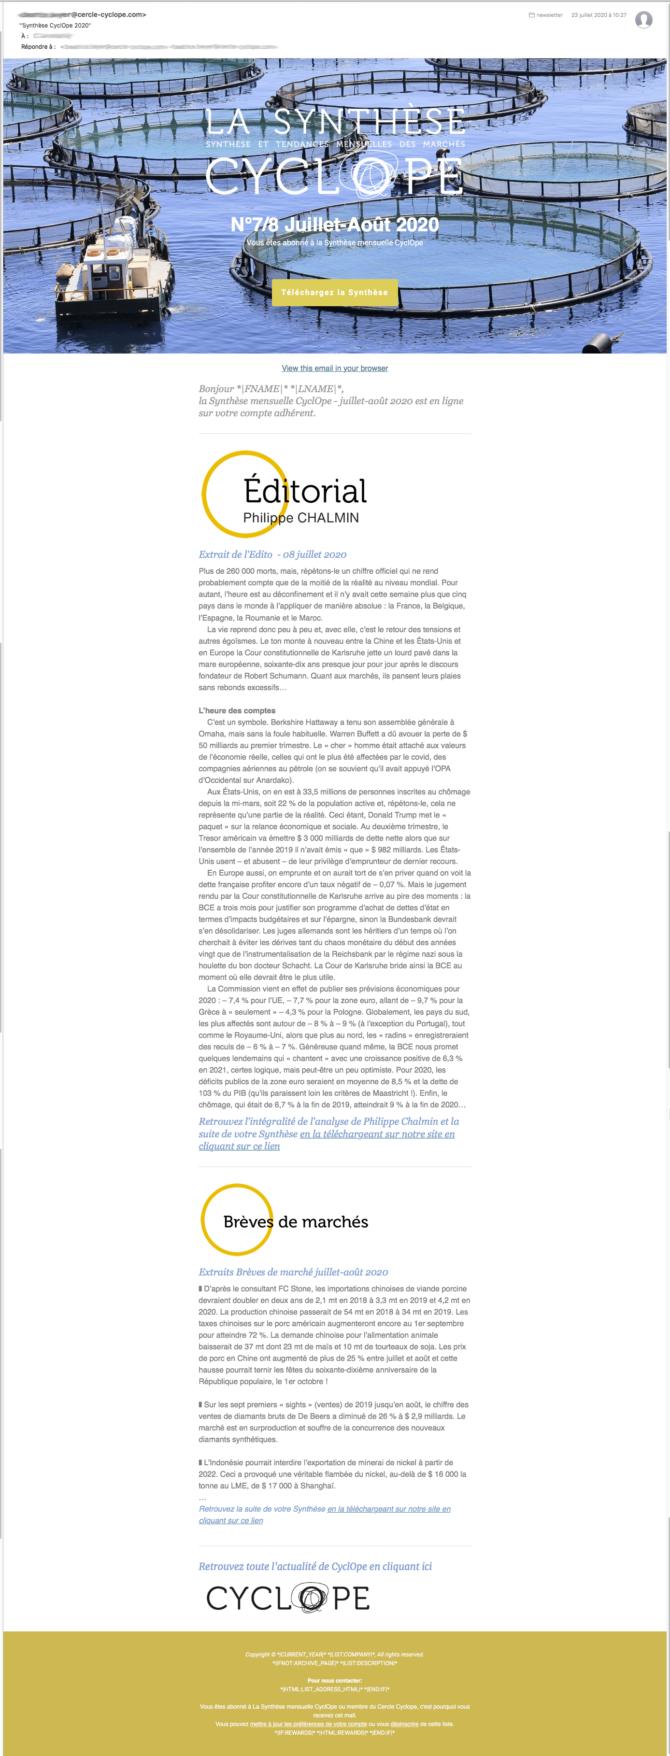 synthesCyclope-newsletter-2020